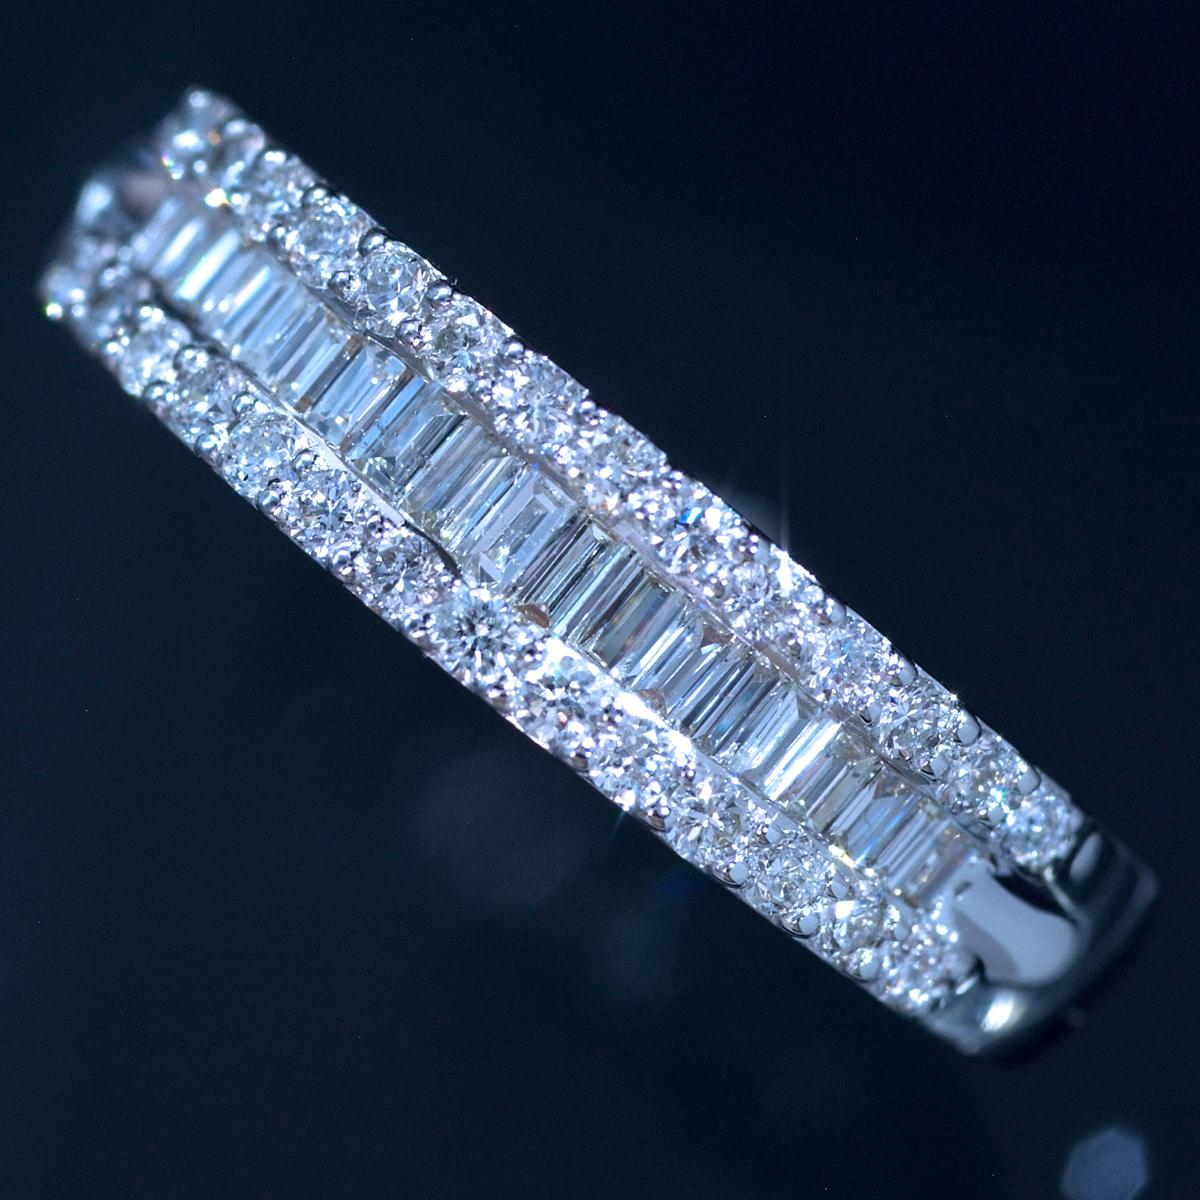 *R4251 新品!業者向け令和新作Design! 天然上質ダイヤモンド0.50ct 最高級18金WG無垢リング